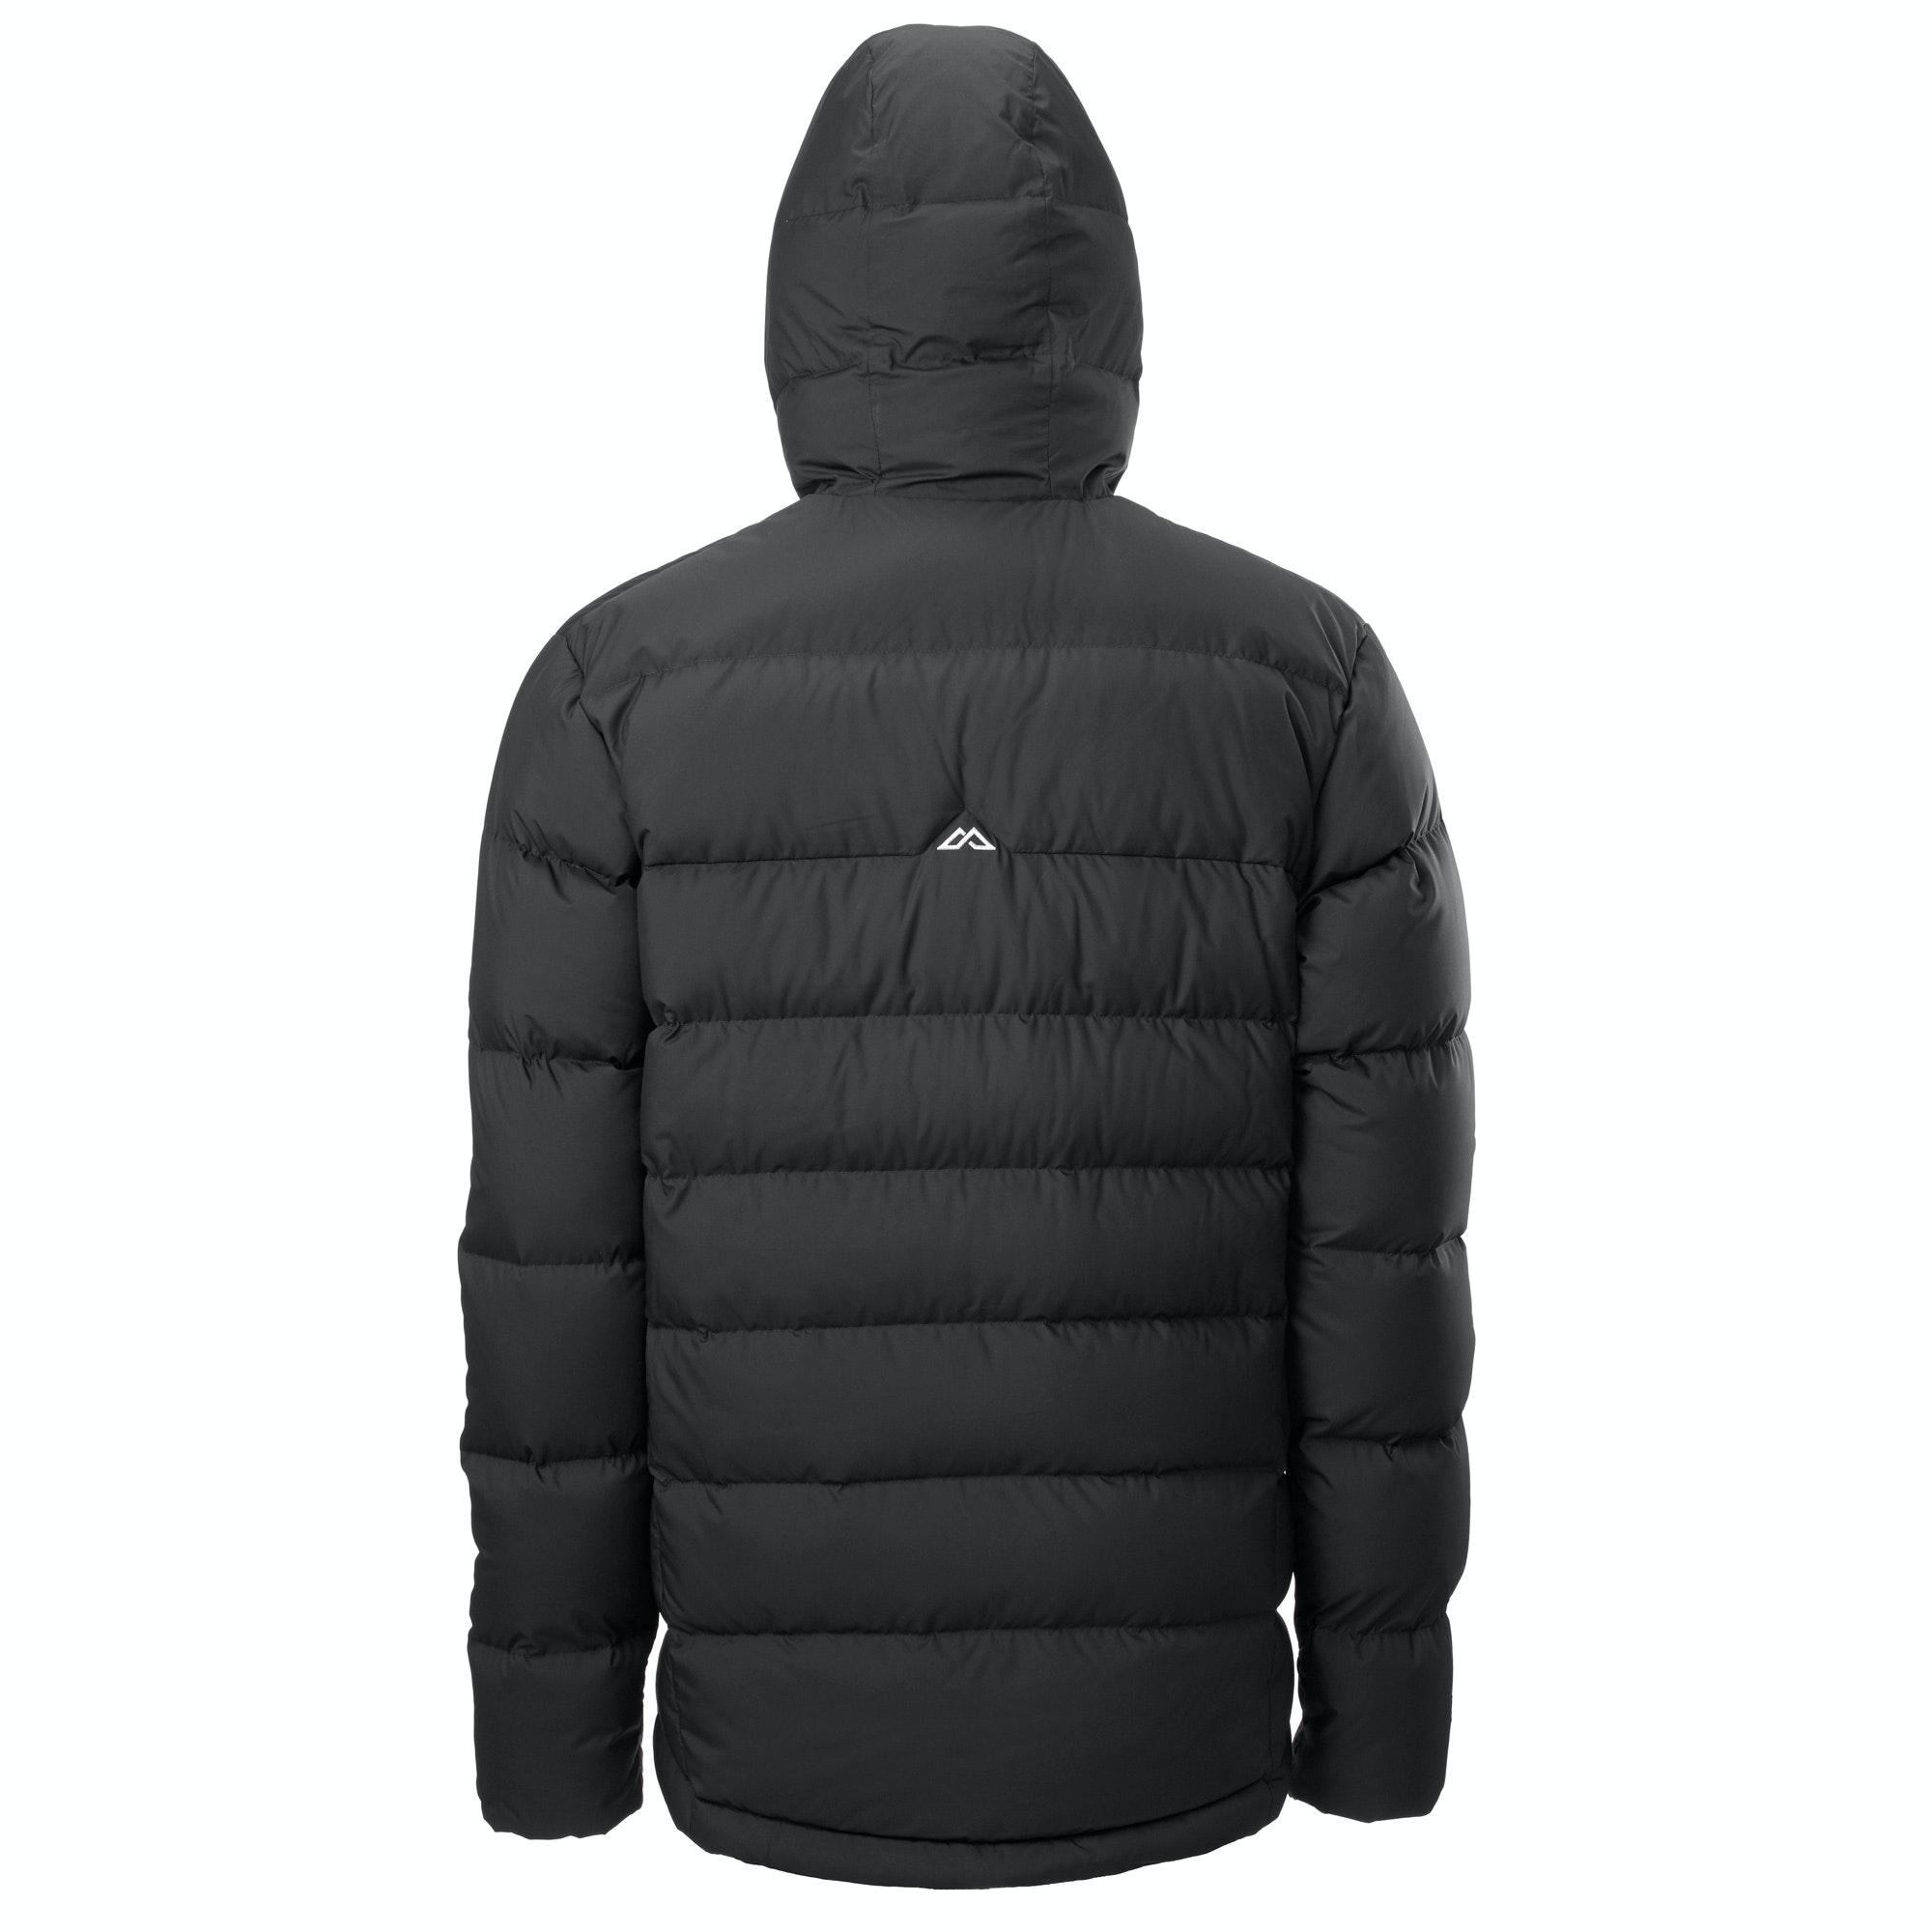 NEW-Kathmandu-Epiq-Men-039-s-Hooded-Warm-Winter-Duck-Down-Puffer-Jacket-v2 thumbnail 8